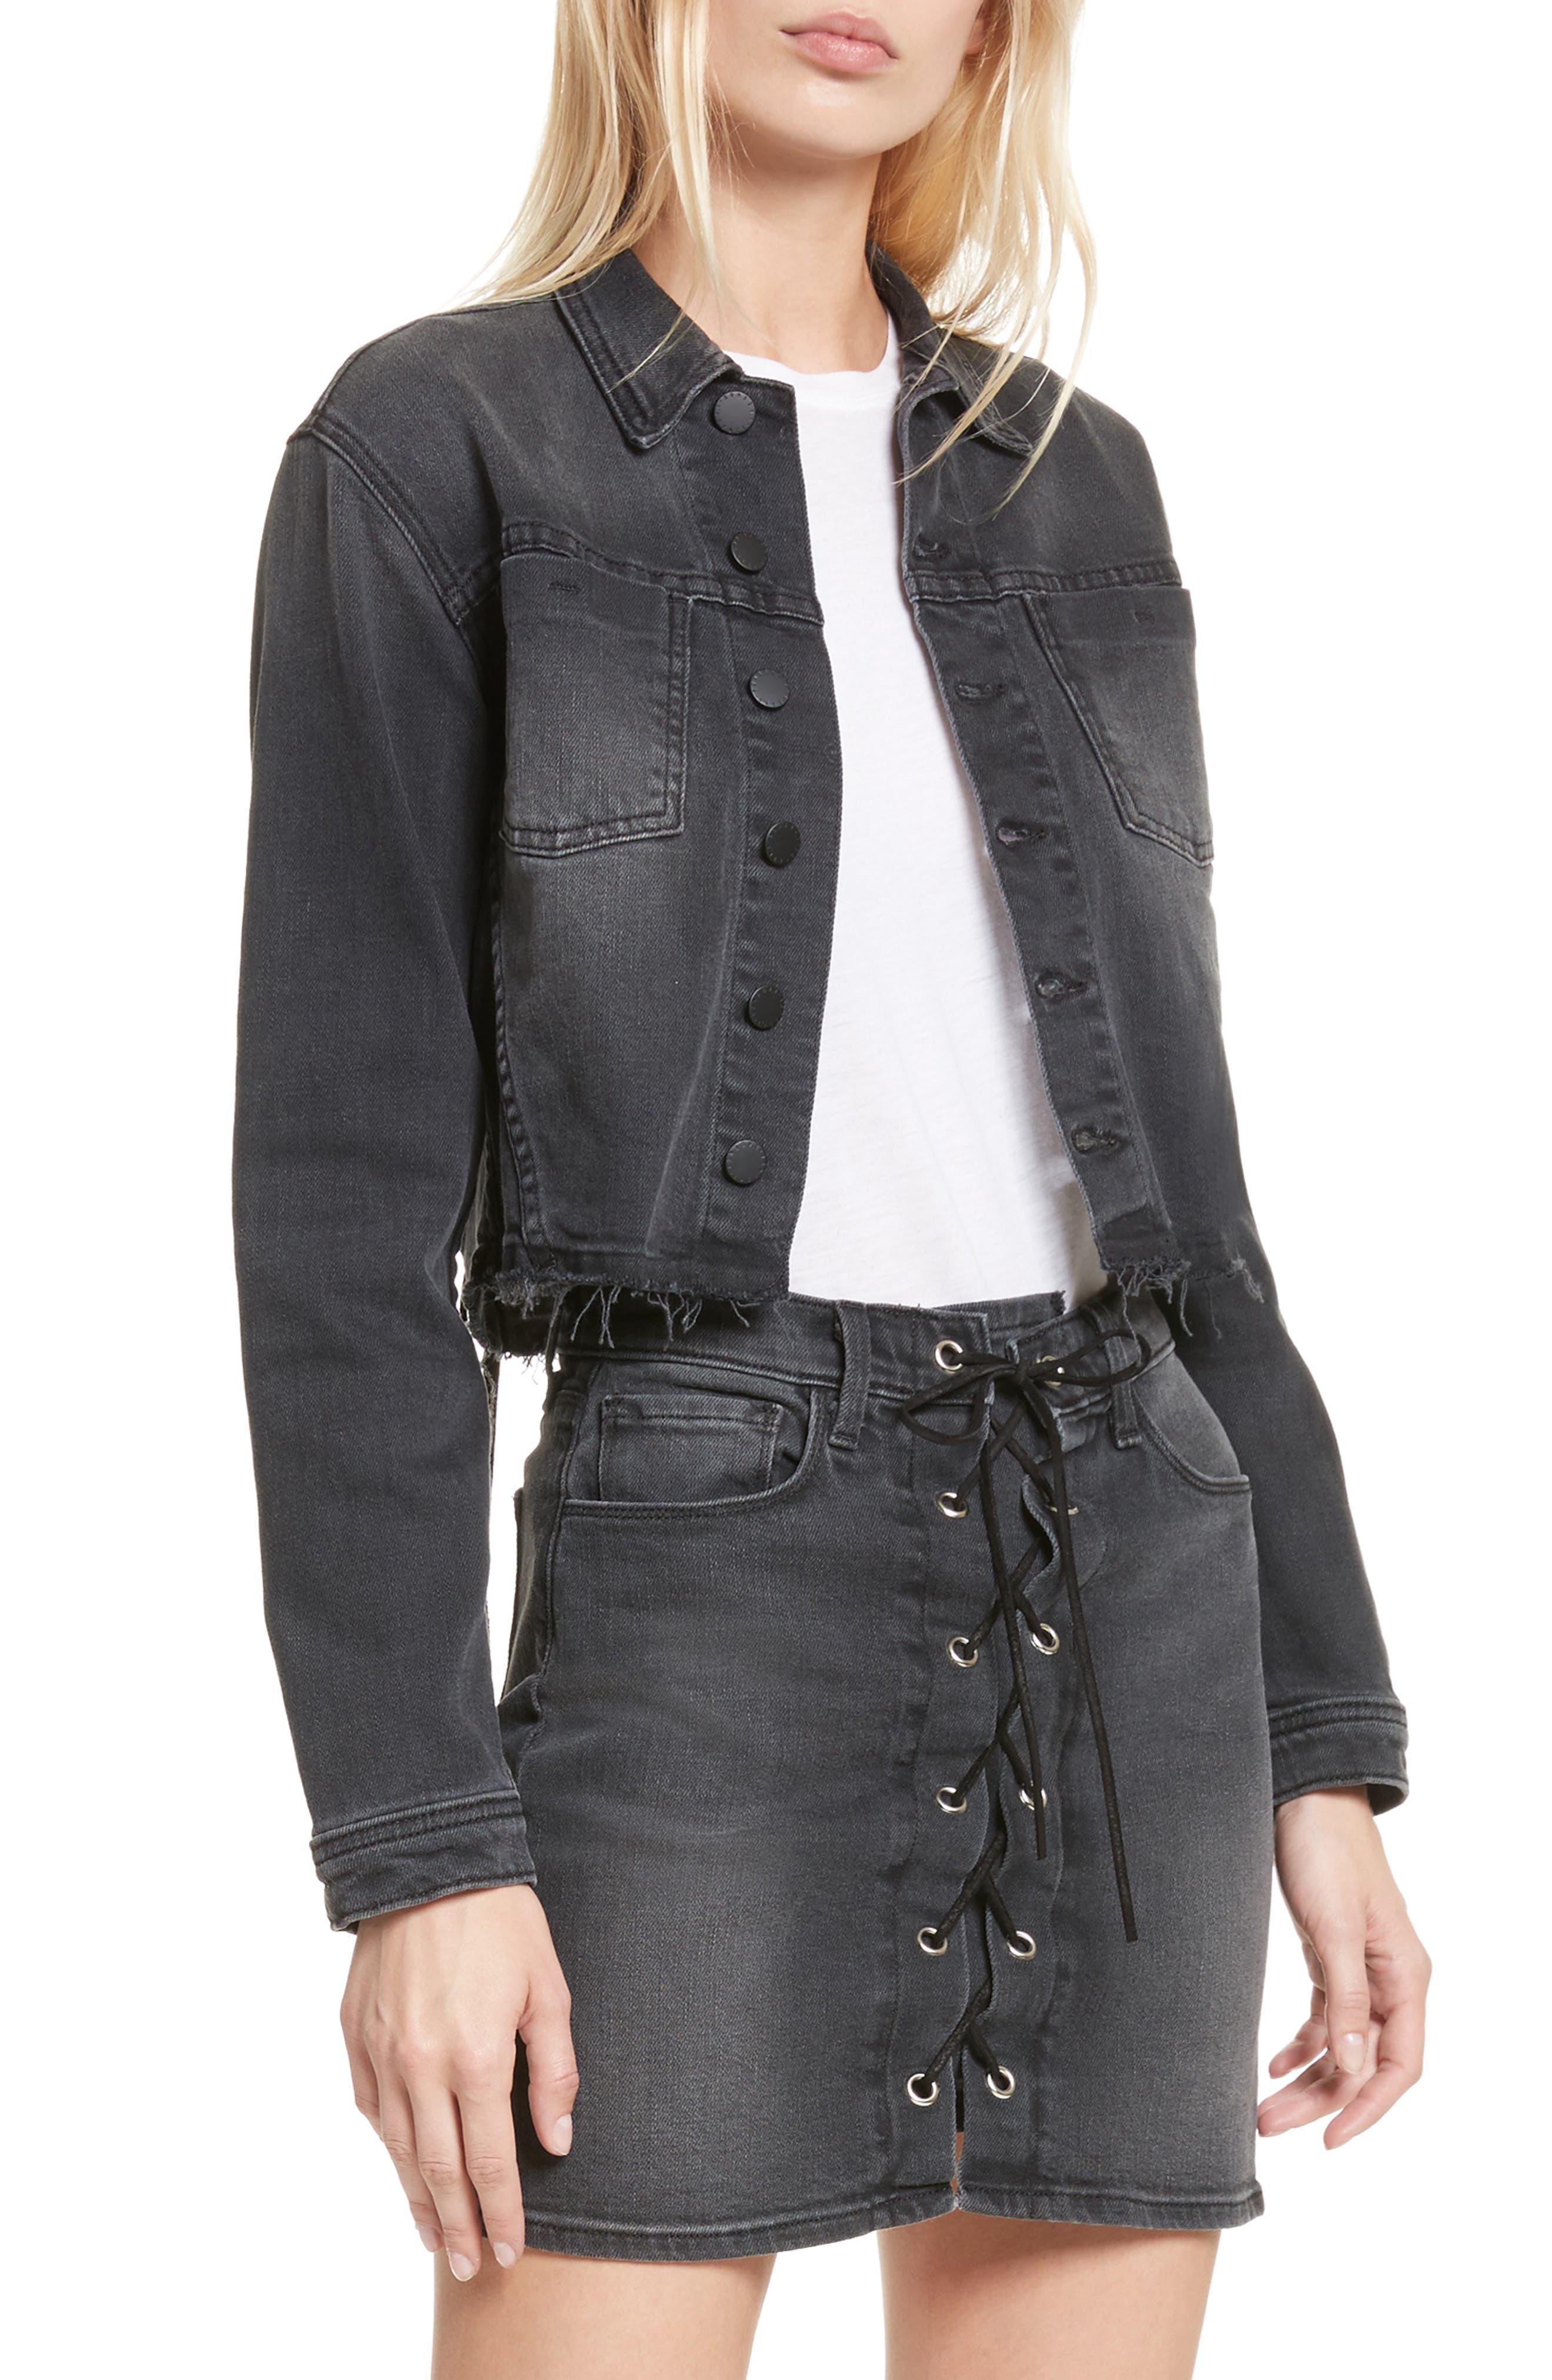 Zuma Lace Up Crop Denim Jacket,                         Main,                         color, 006